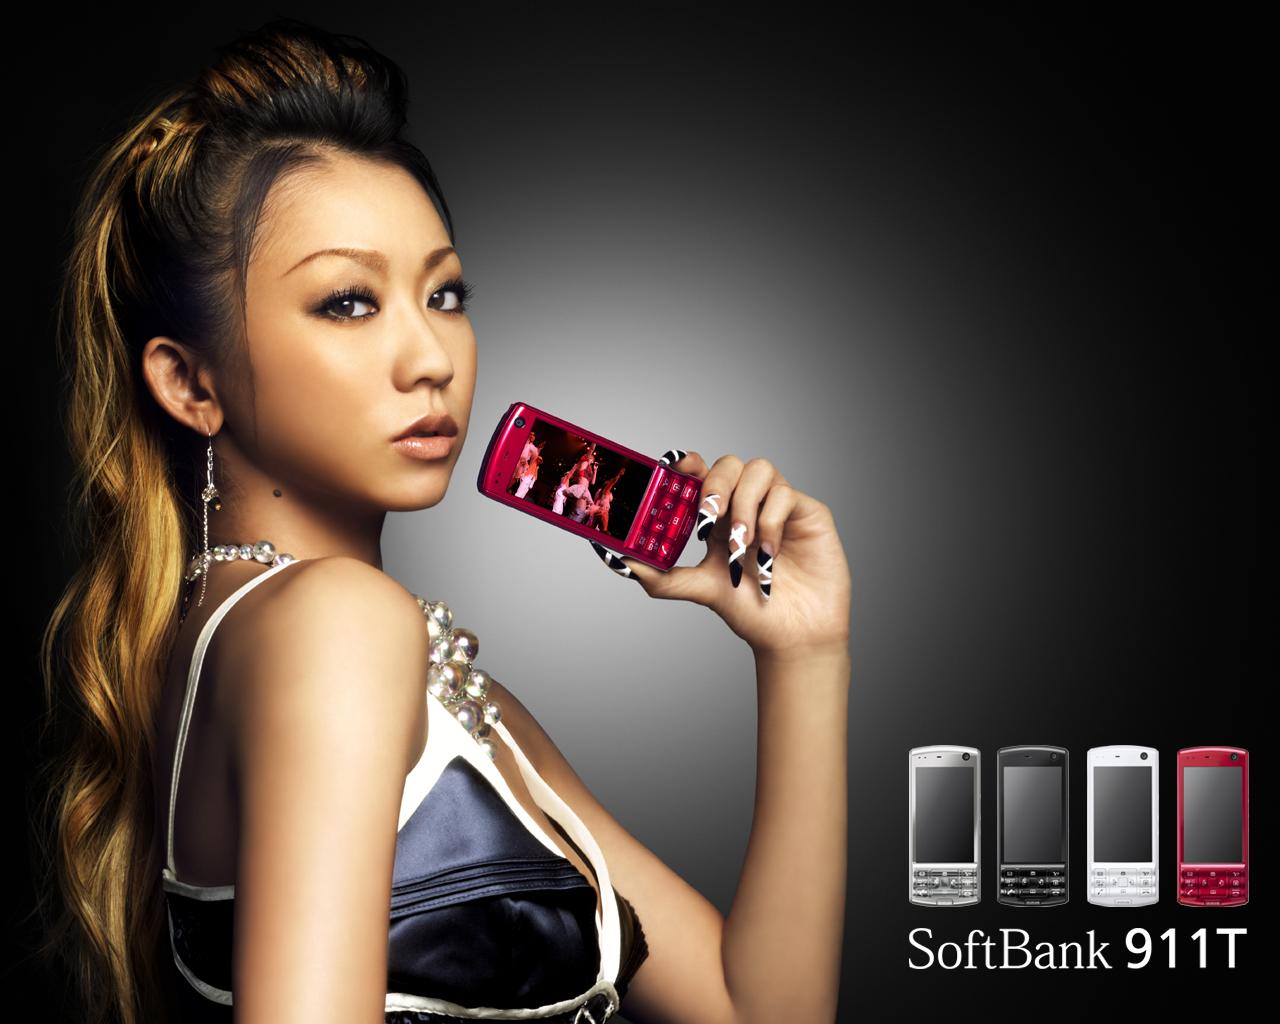 Koda Kumi, SoftBank, promo [PH201025002027]